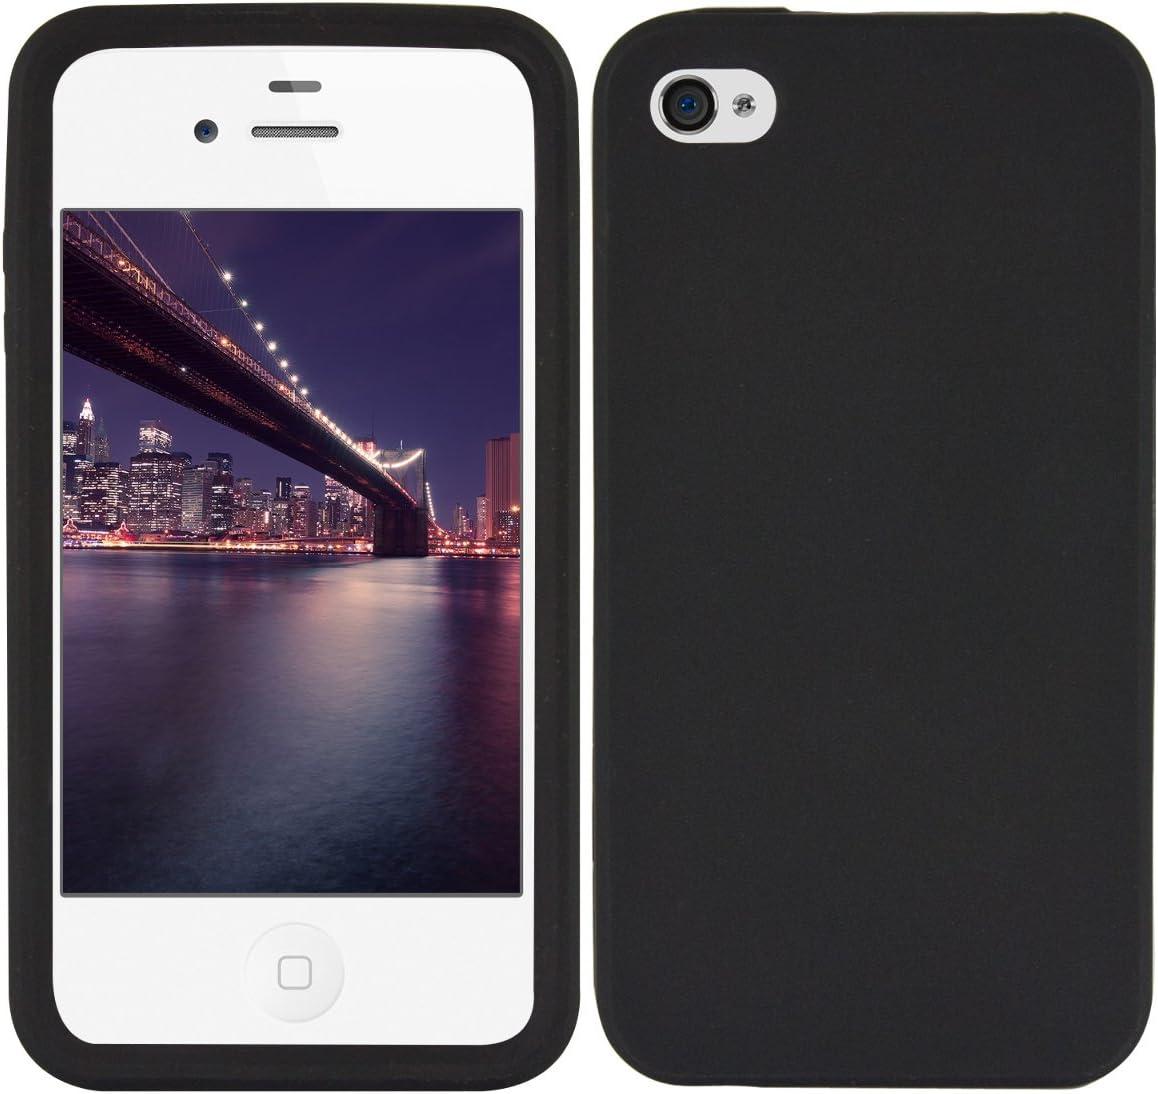 Kwmobile Hülle Kompatibel Mit Apple Iphone 4 4s Handyhülle Handy Case In Schwarz Elektronik